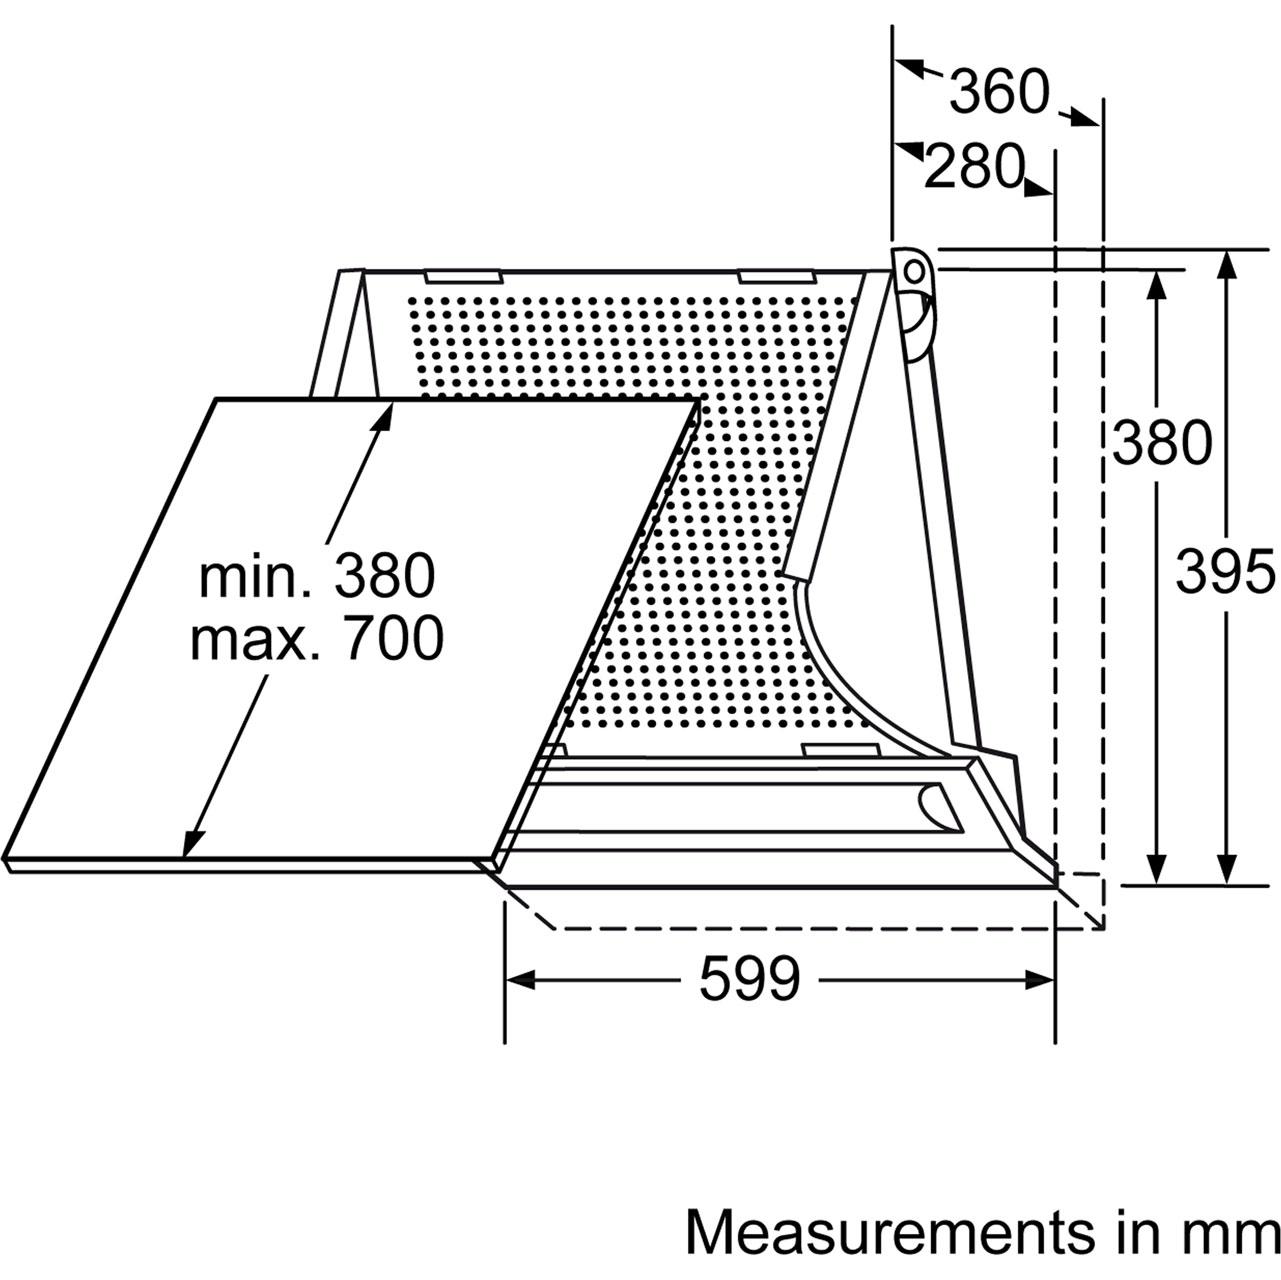 Hobart Am Wiring Diagram on hobart dishwasher wiring-diagram, hobart c44a diagram, hobart am 14 pricing,